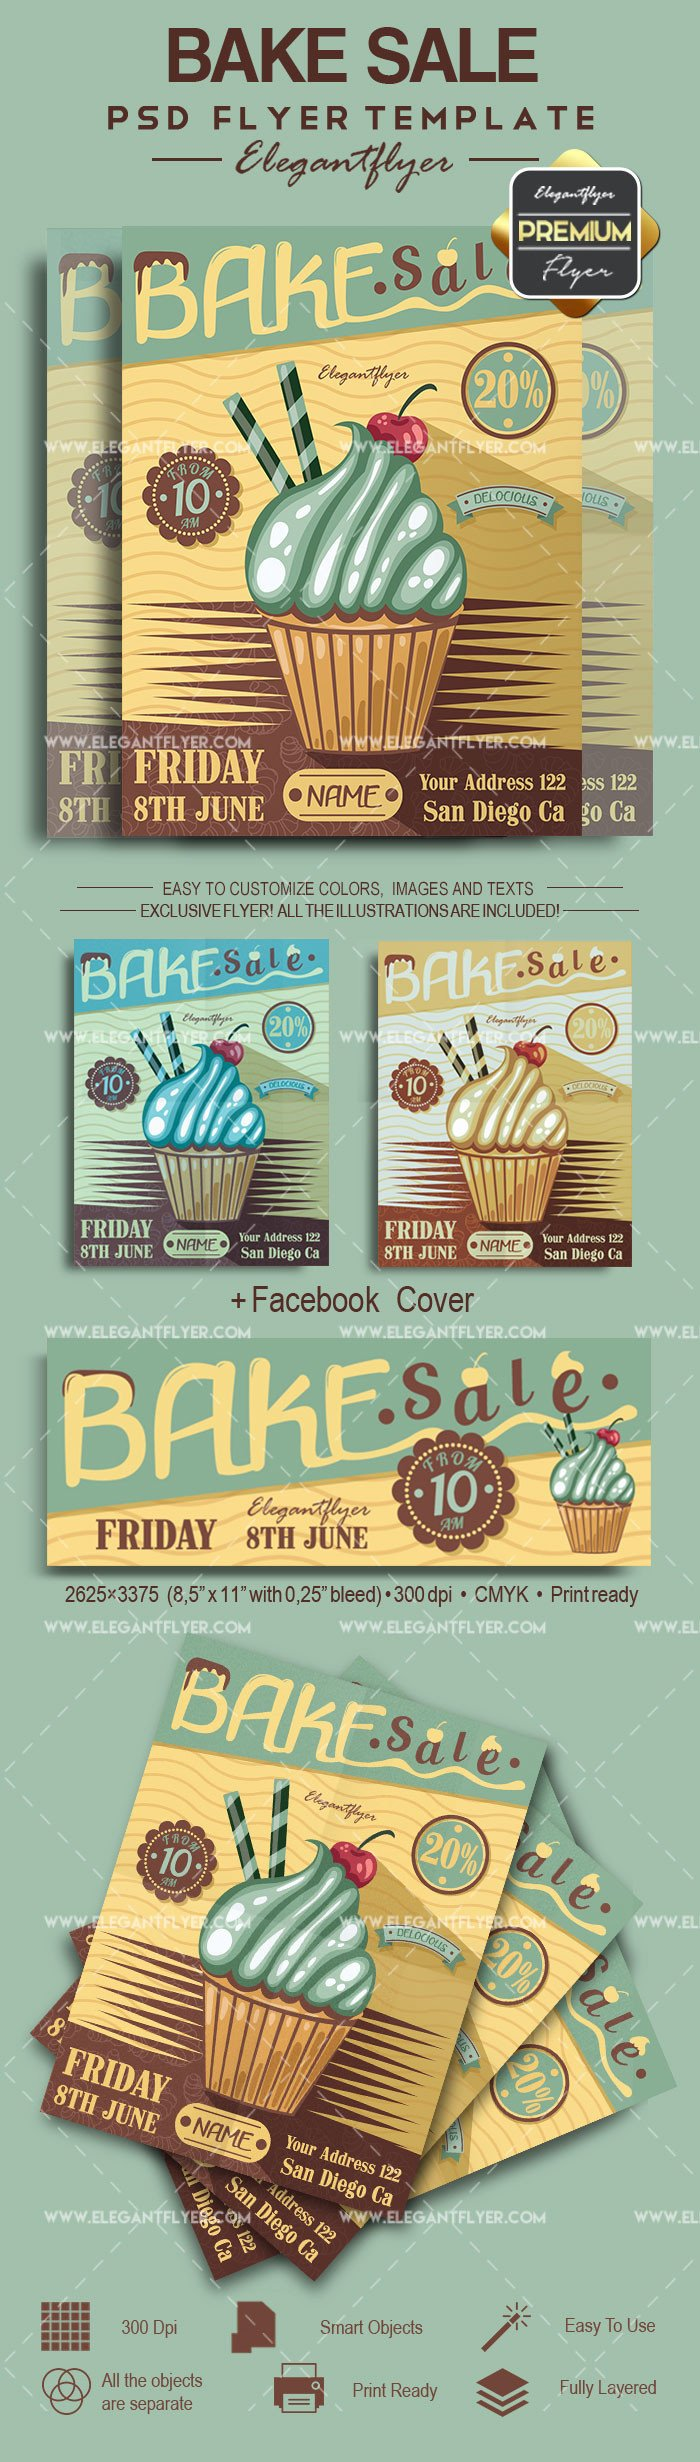 Bake Sale Flyer Template Bake Sale Psd Poster – by Elegantflyer